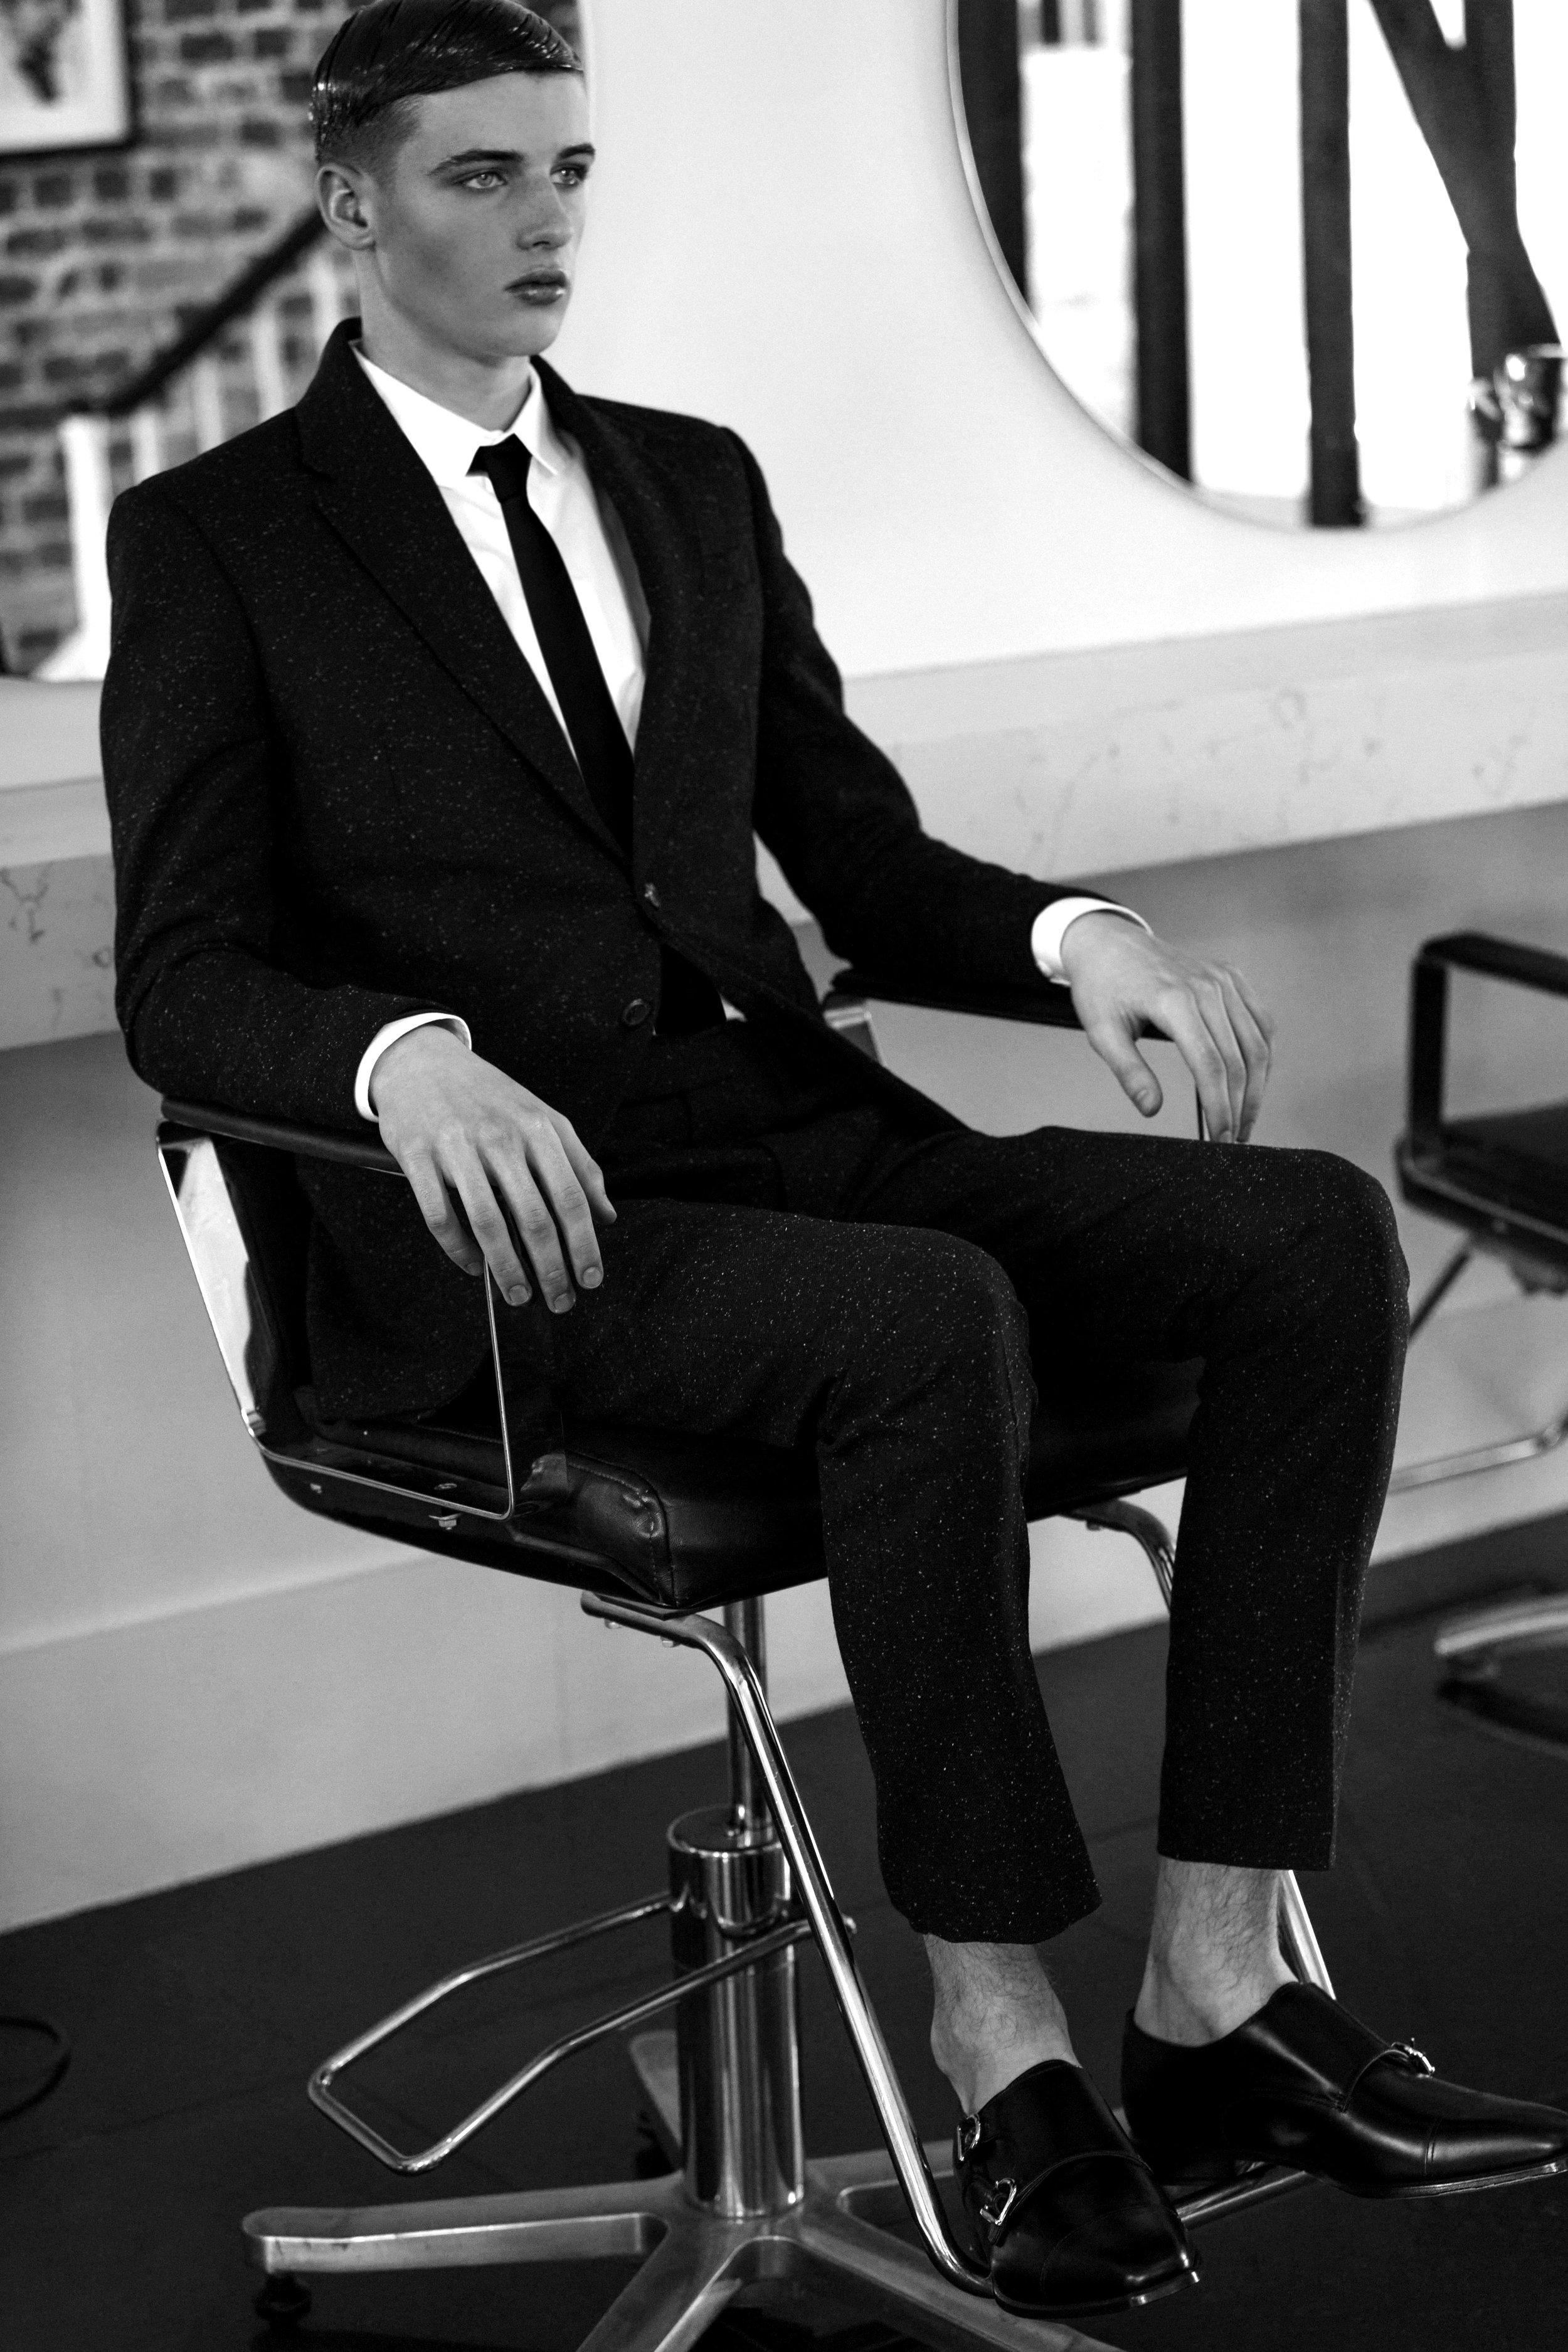 Black Suit  Joshua Kane , Shirt  Topman , Shoes  Mount Street Shoe Company , Sunglasses  Dior Homme .